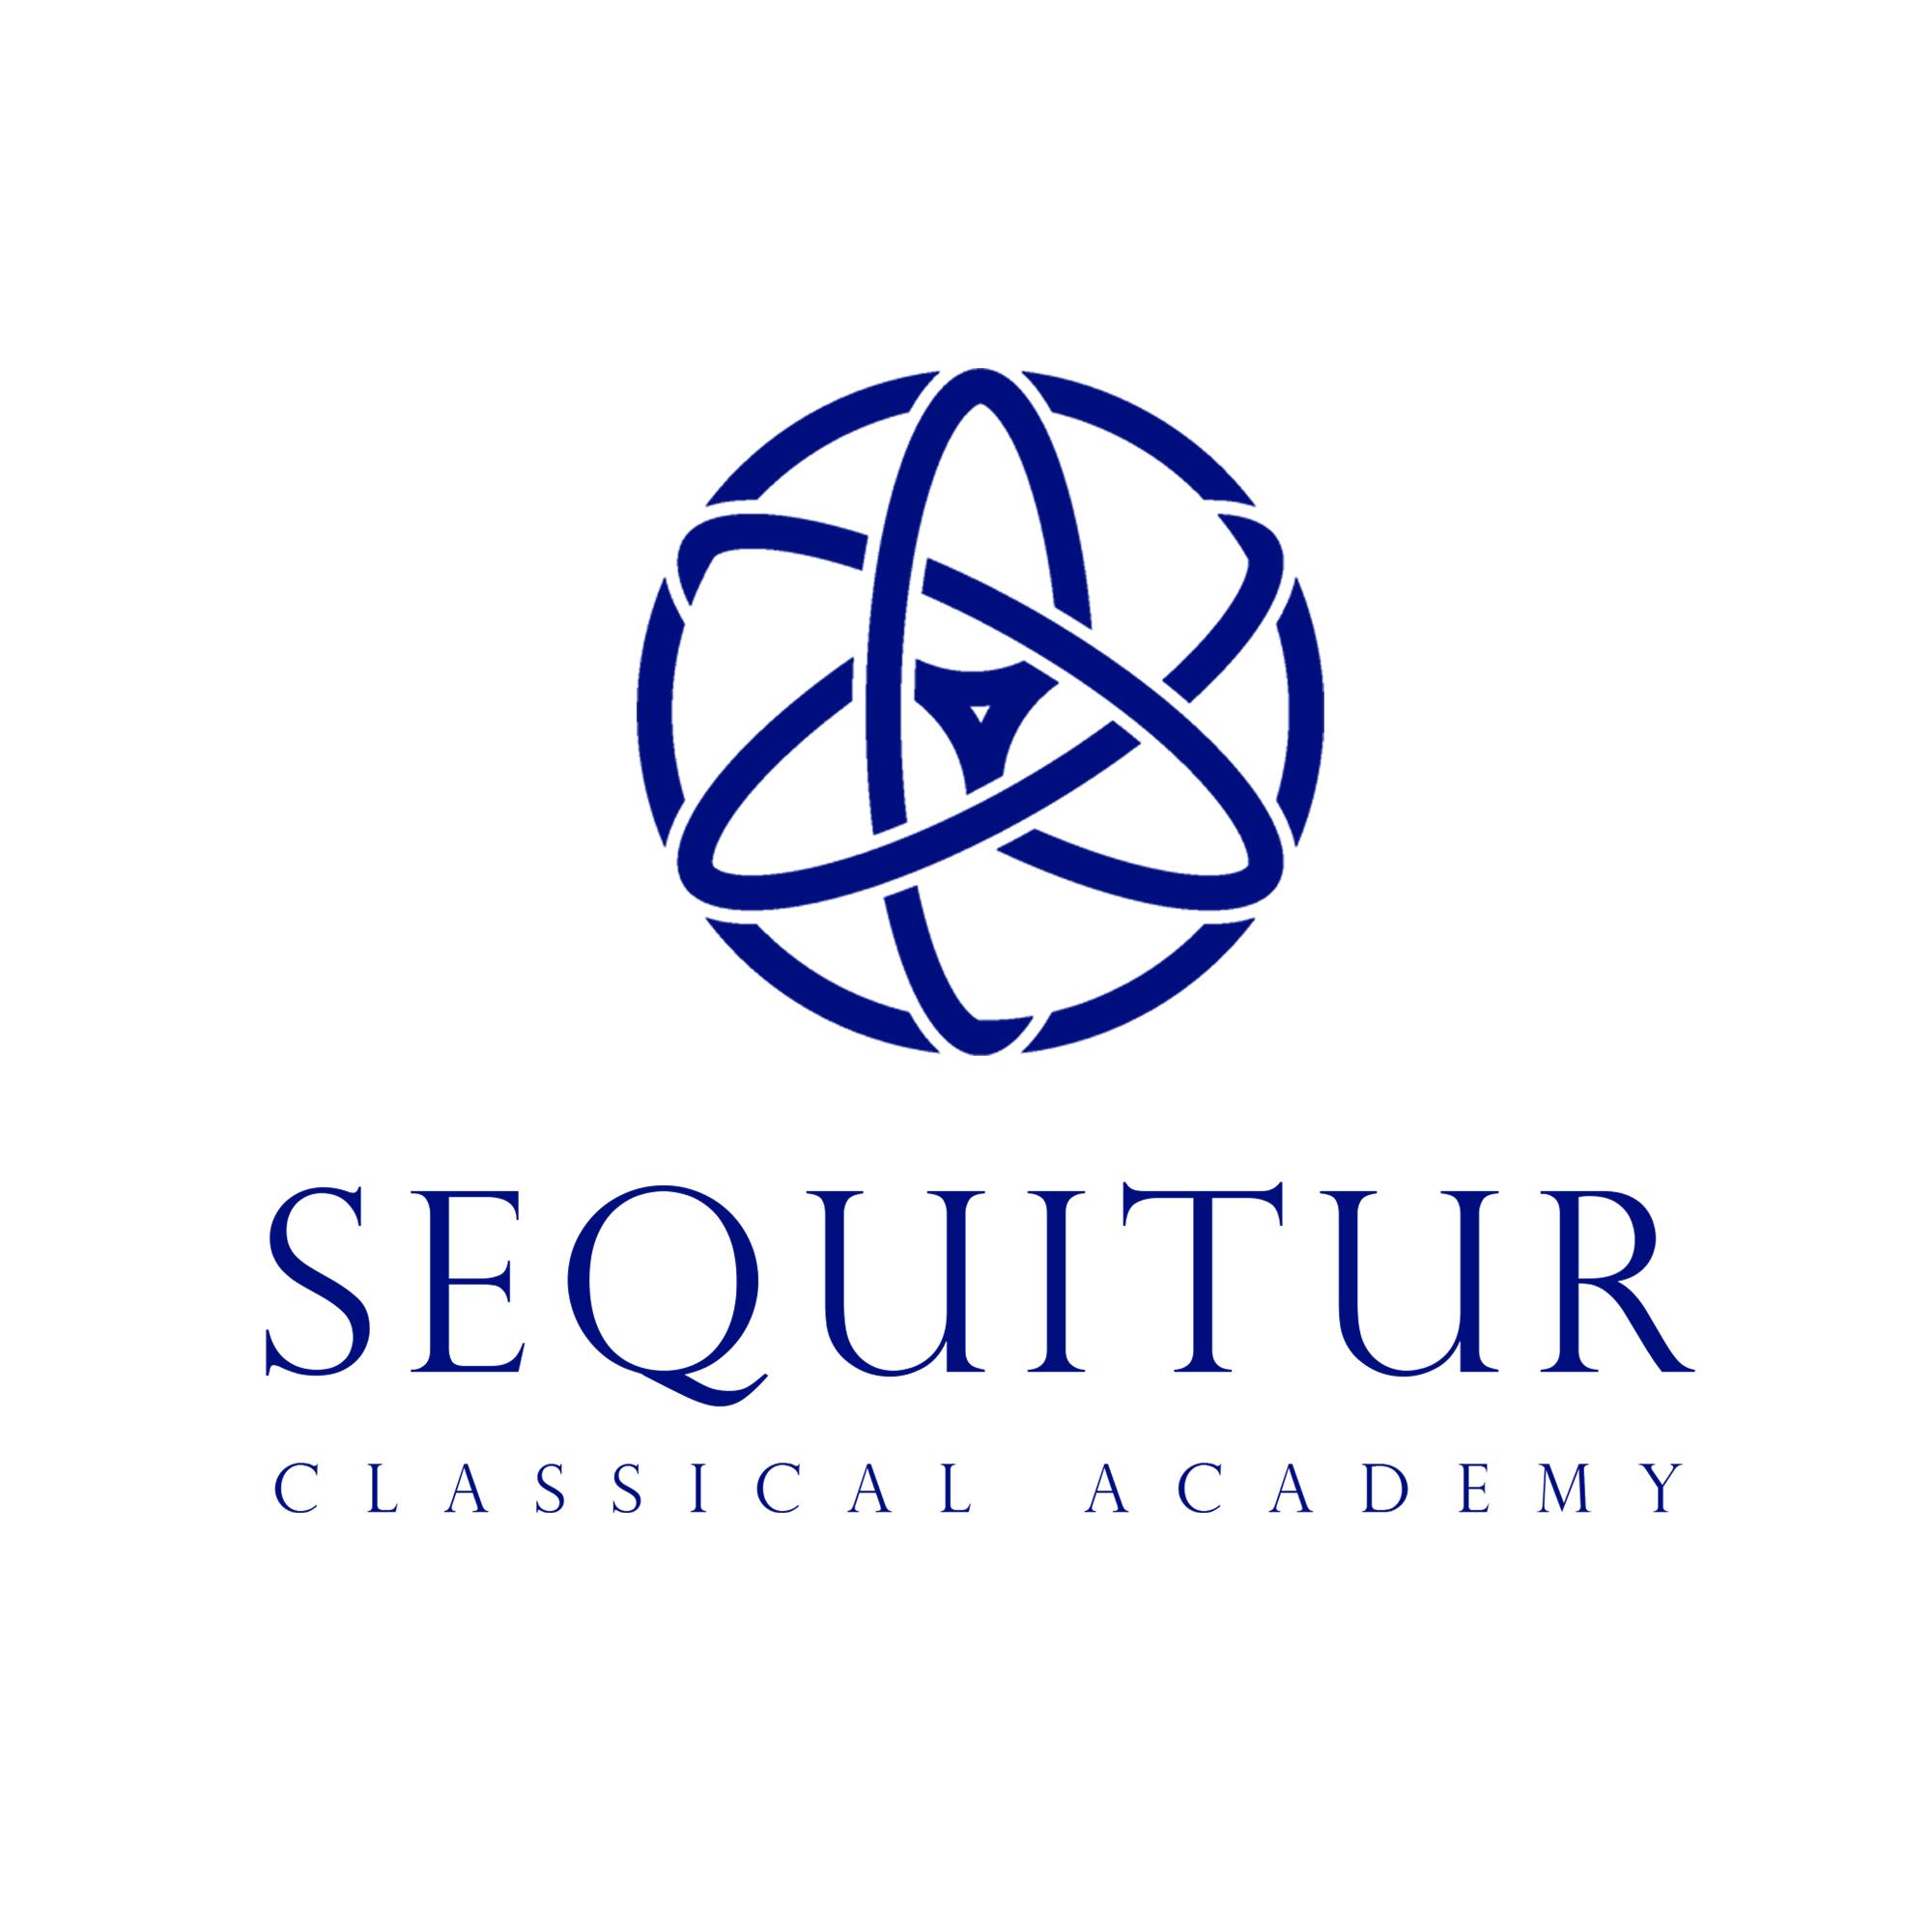 Sequitur Classical Academy